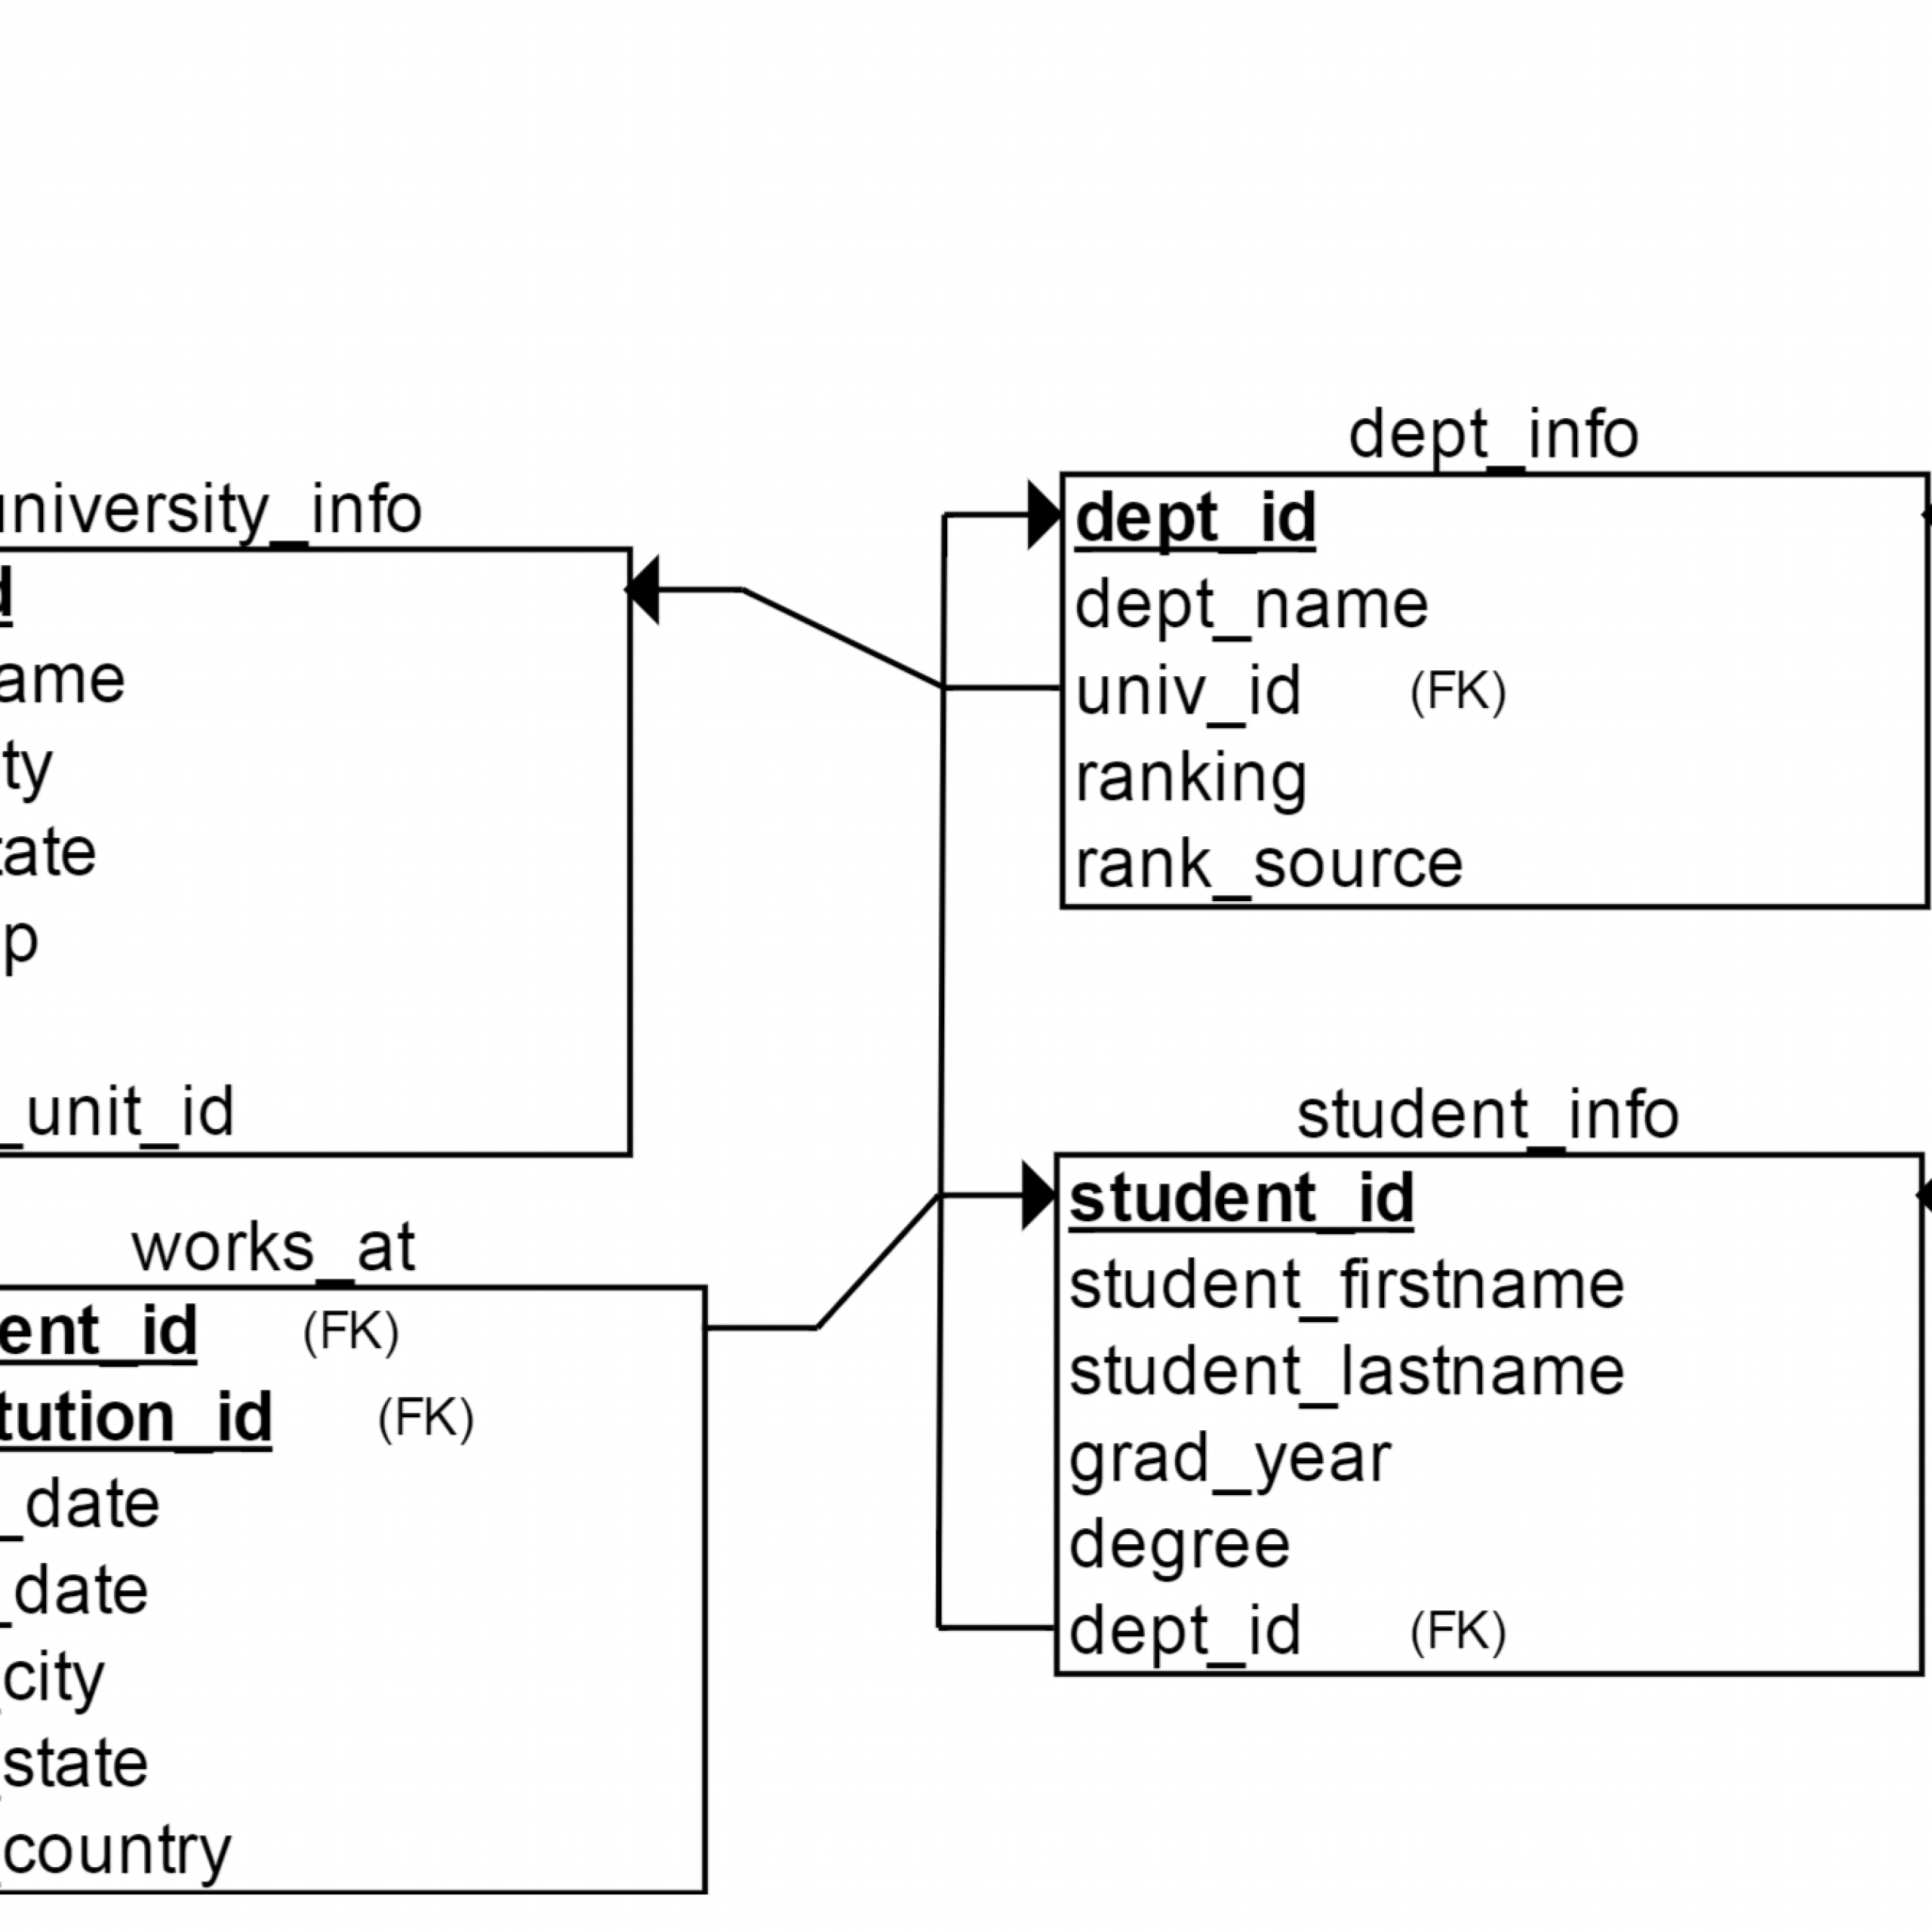 Relational Database Schema 1.0 – Hired-Phd in Relational Database Model Diagram